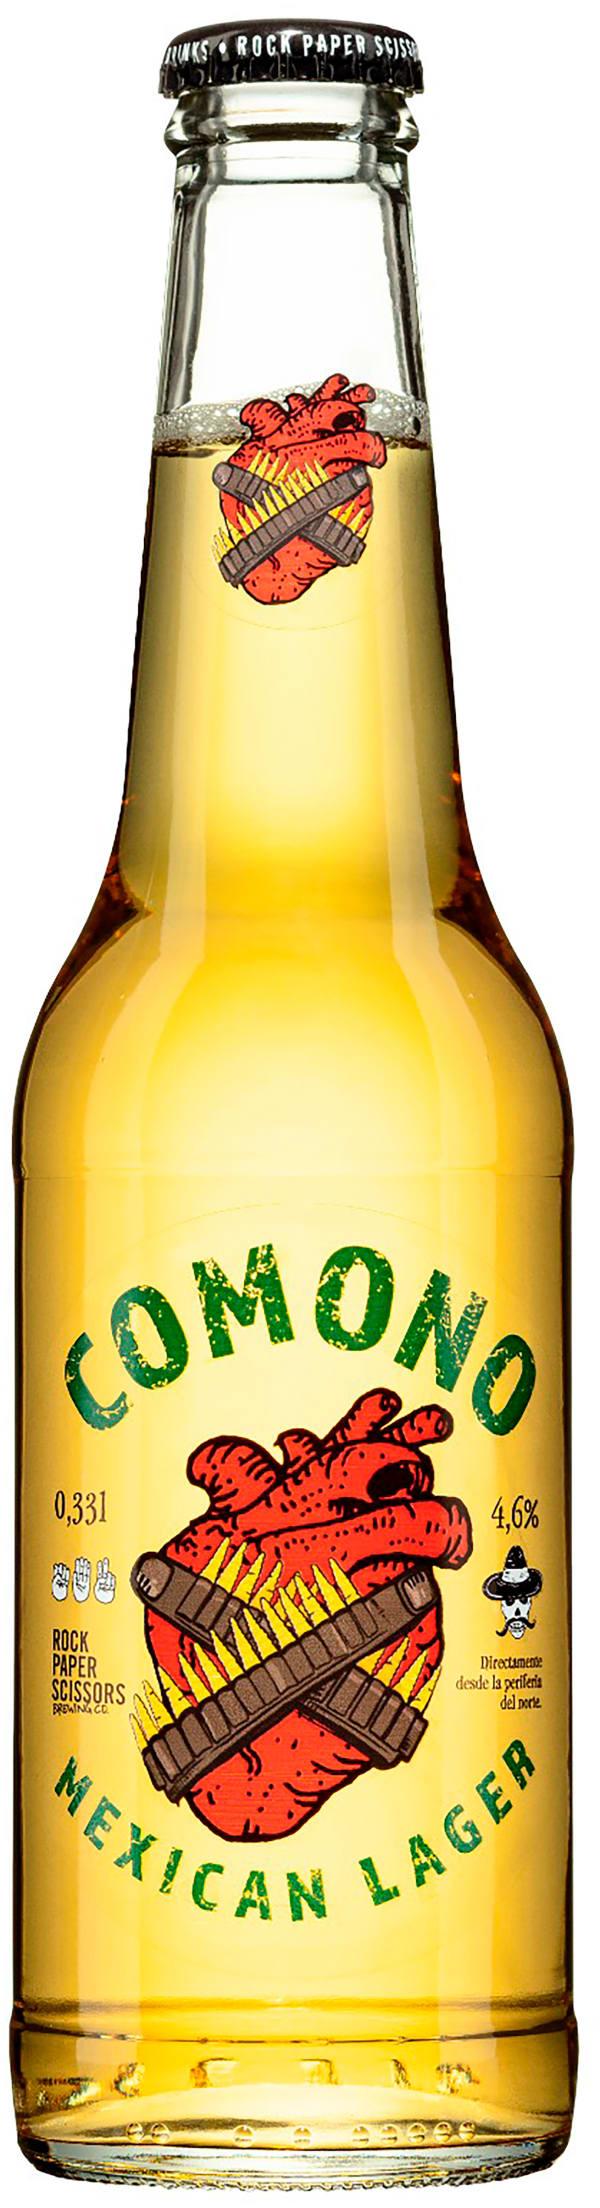 RPS Comono Mexican Lager